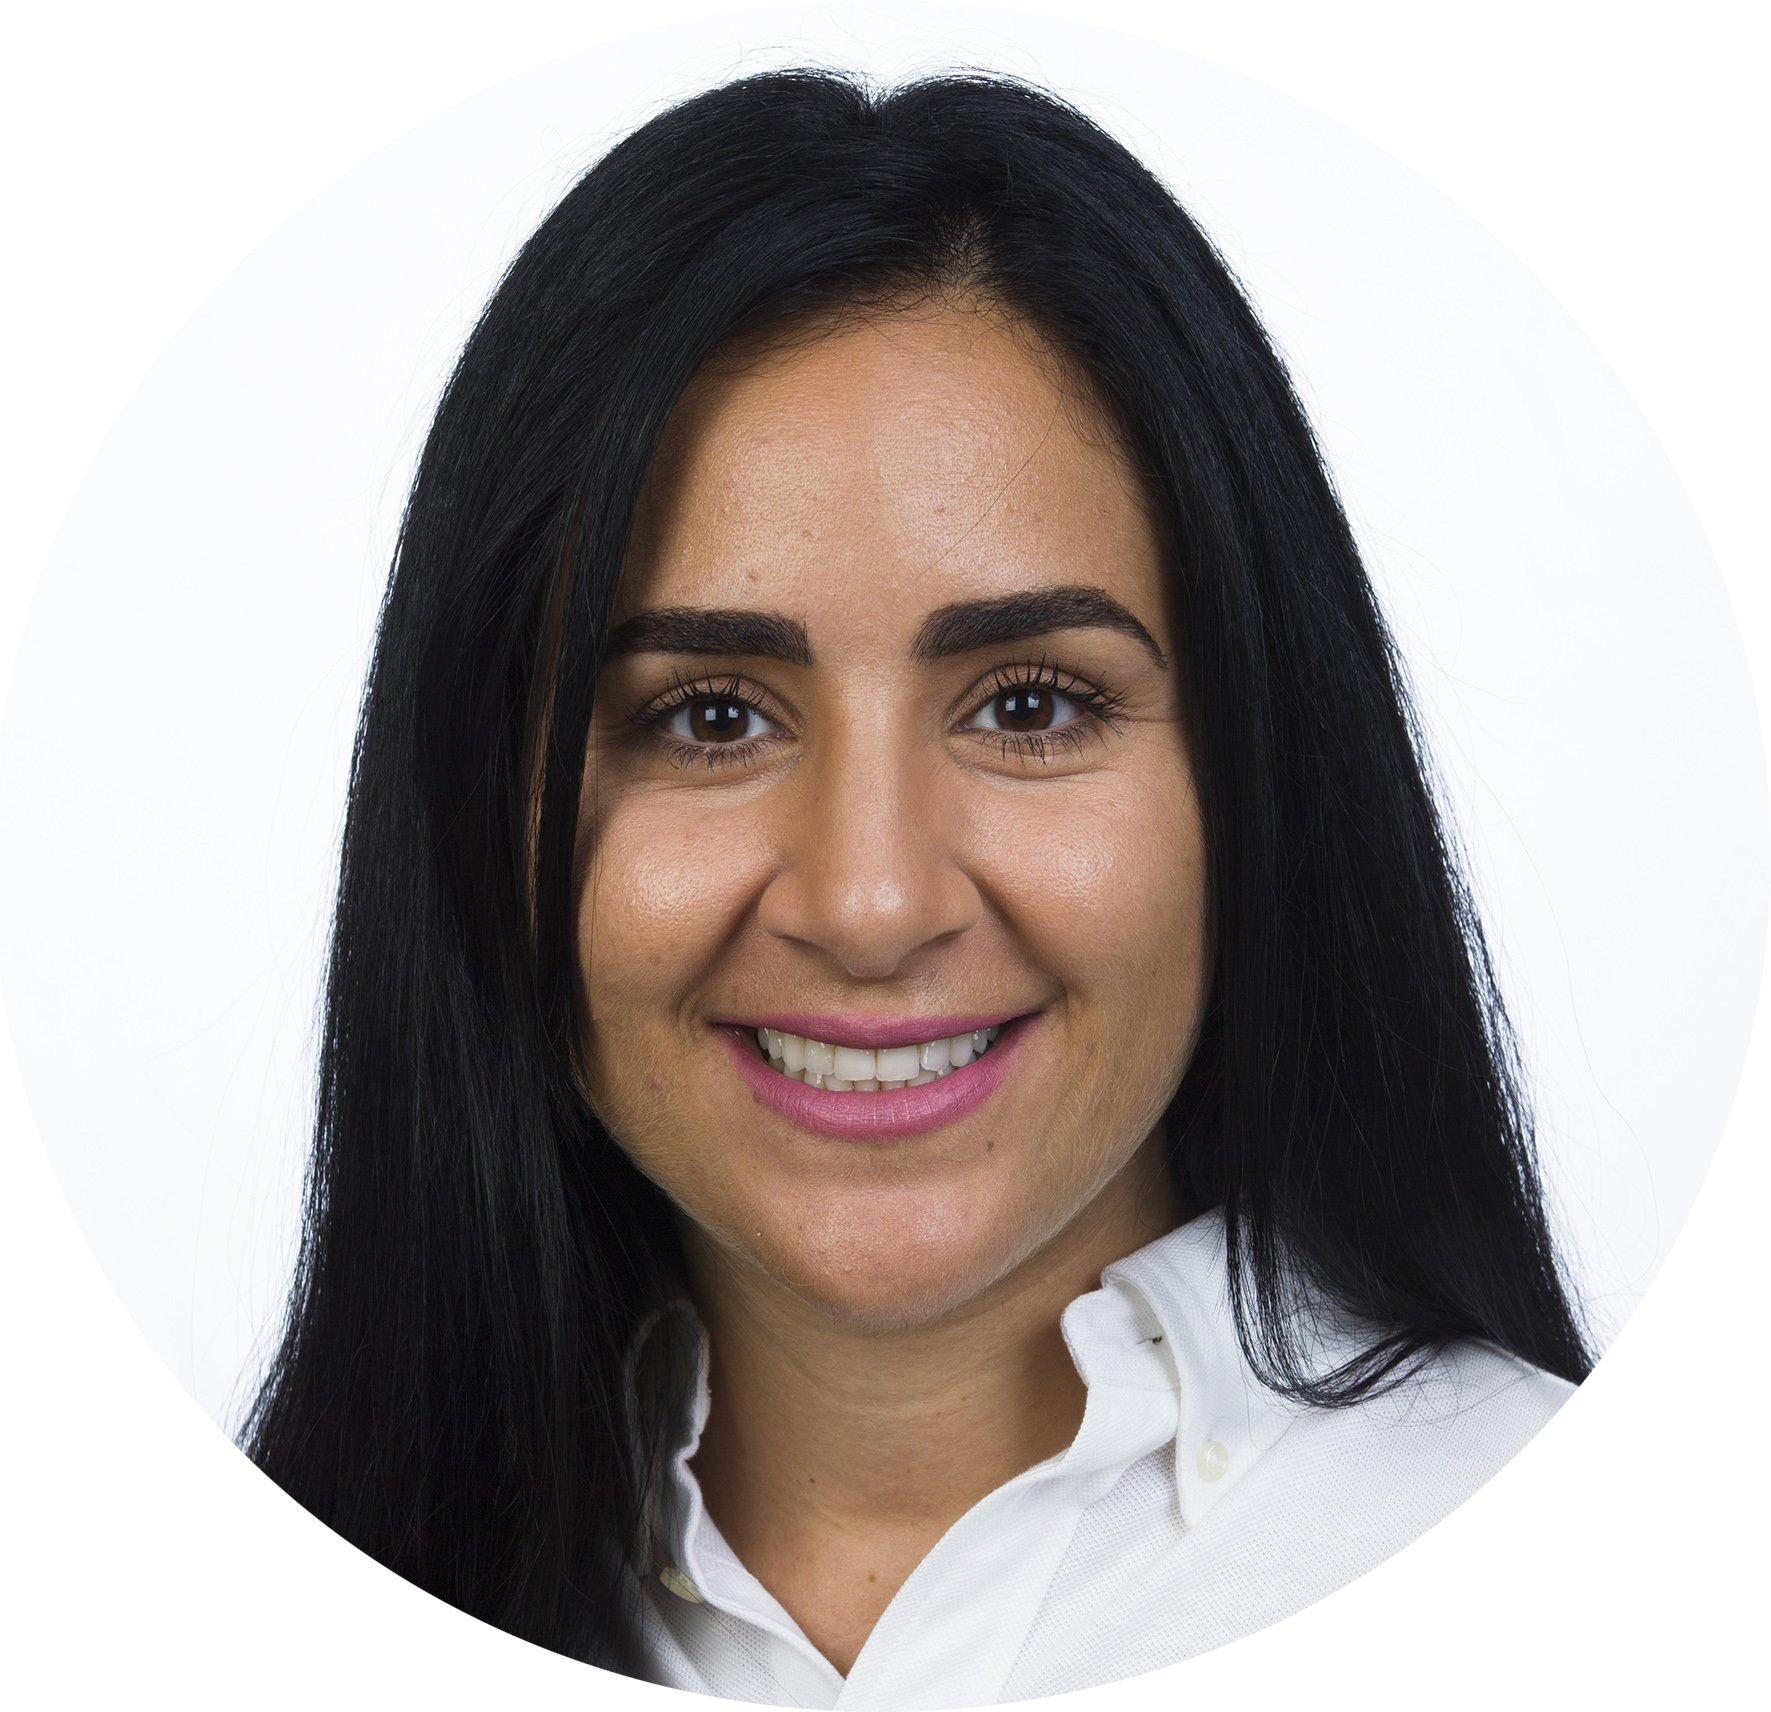 Binaji  Marouf, kommunikatör